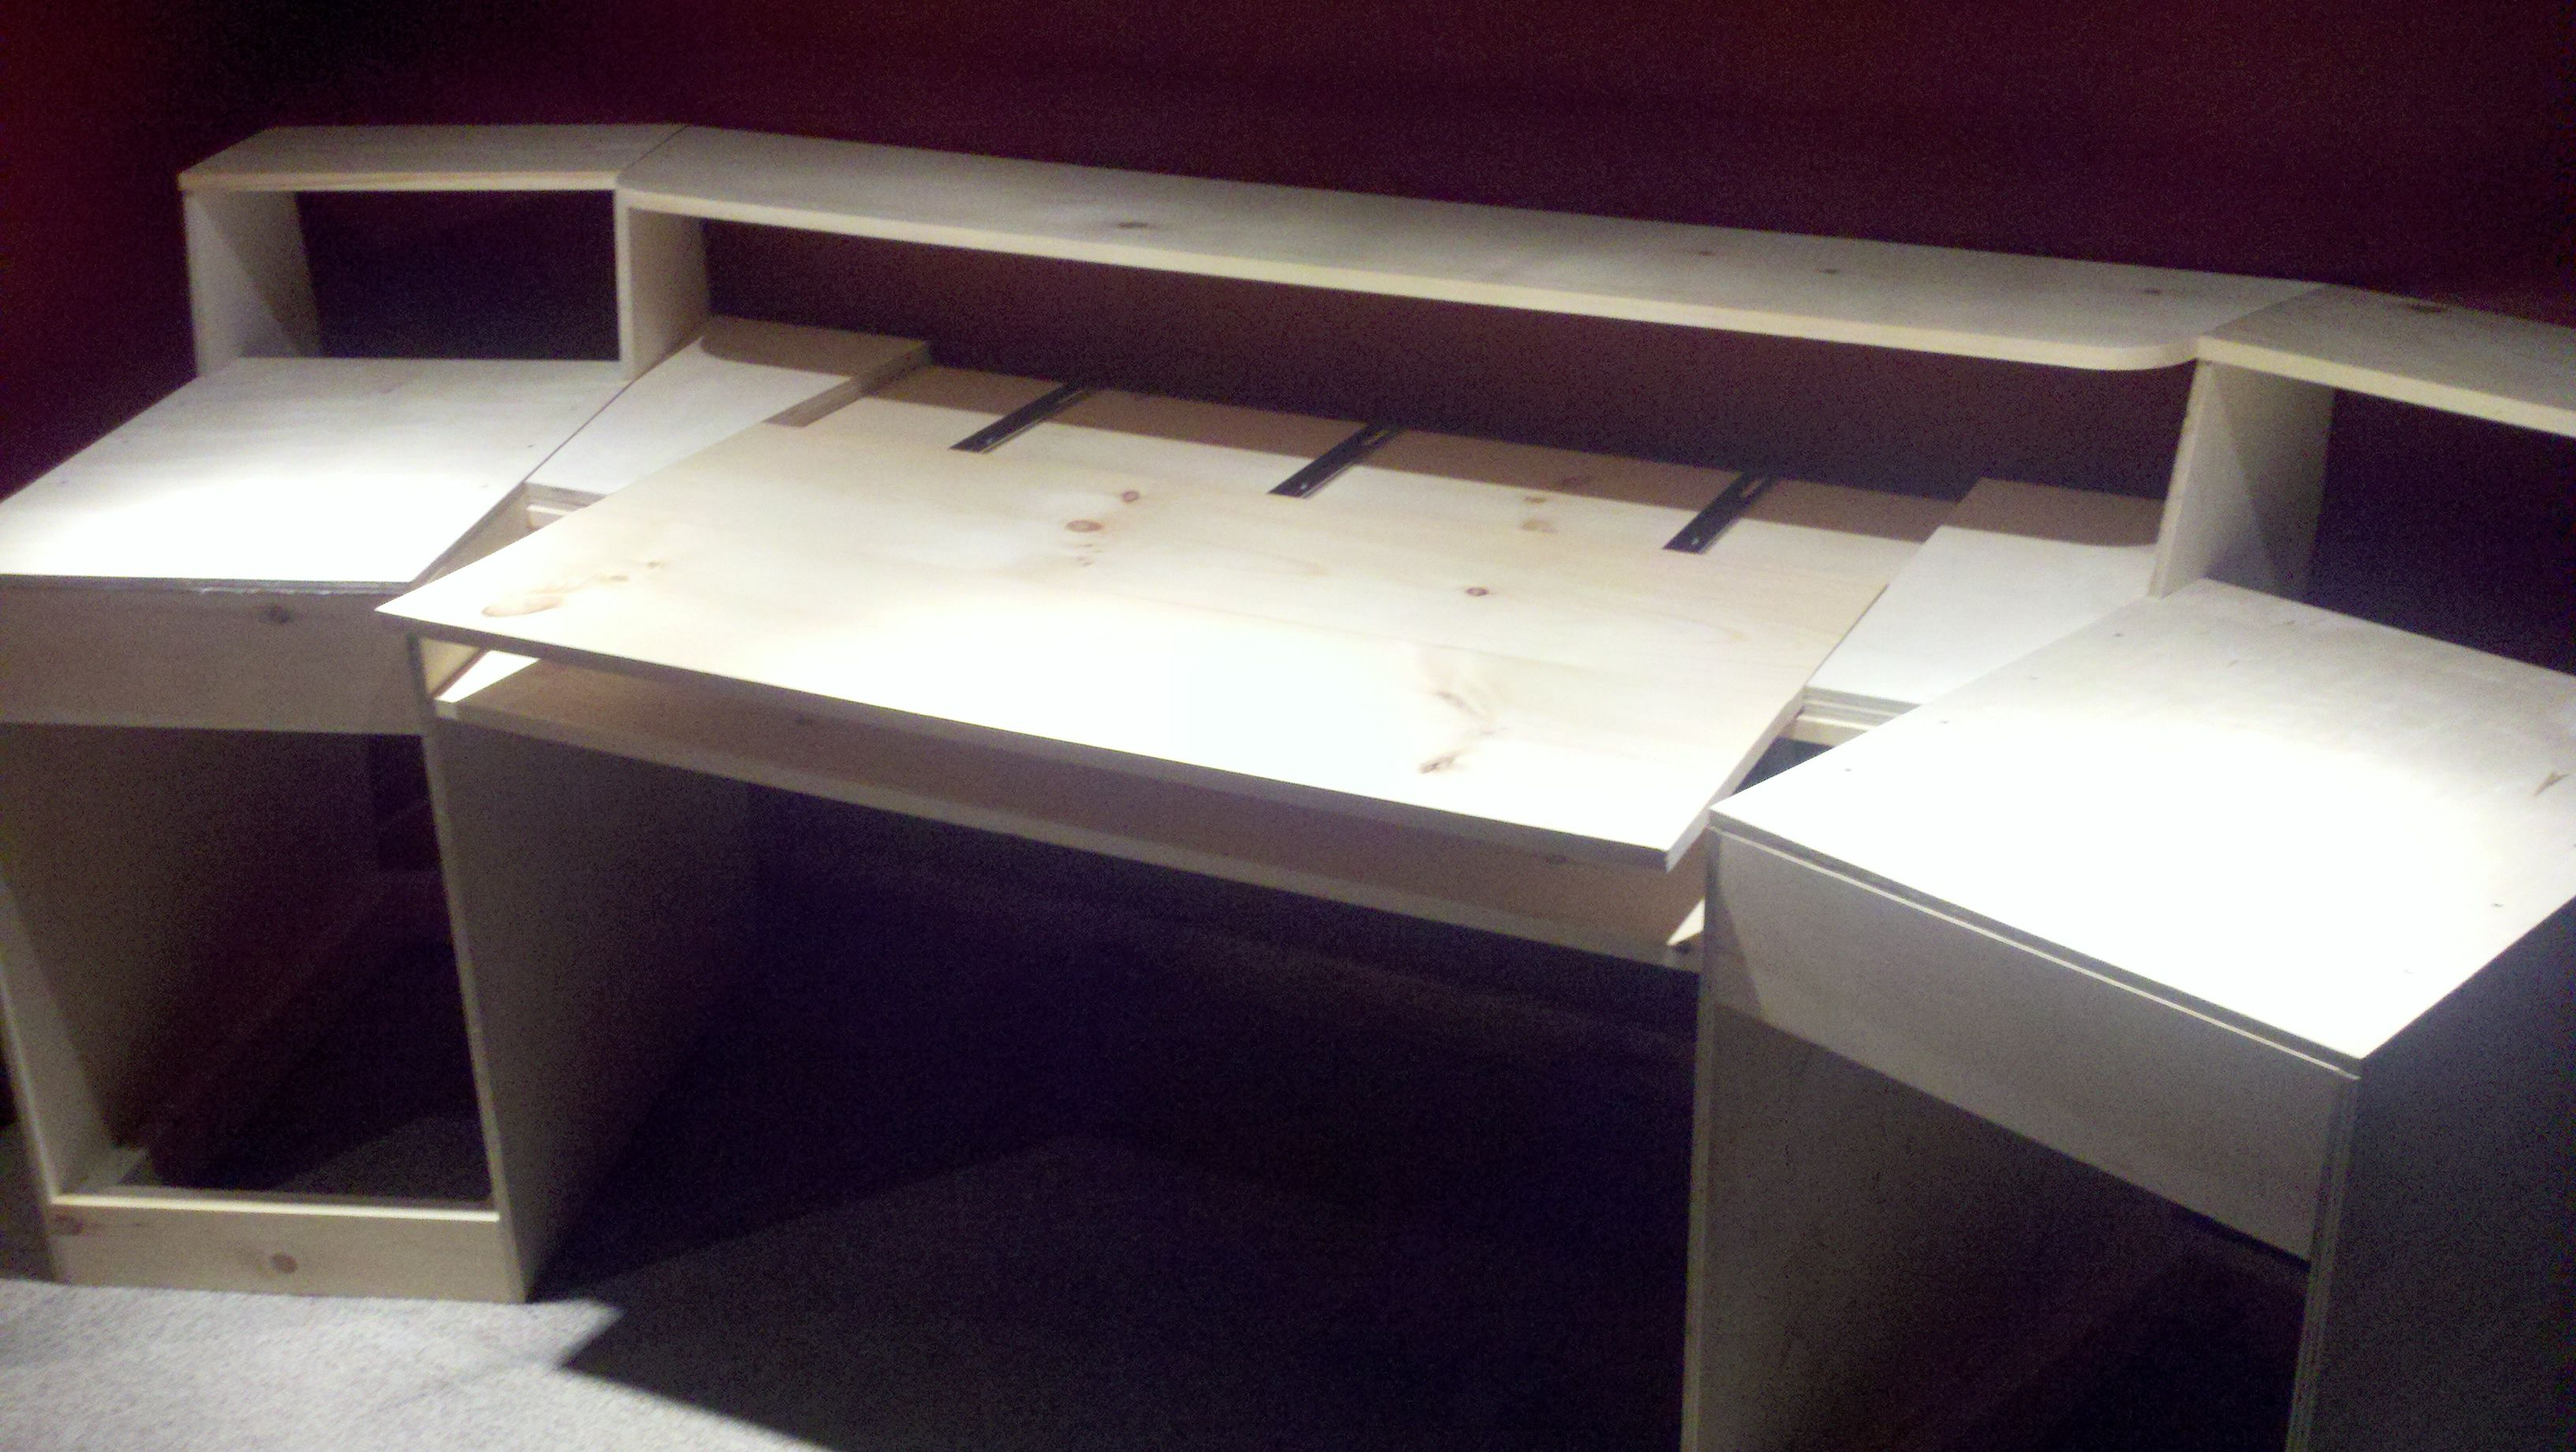 Woodworking Plans Home Studio Desk Plans Free Download Home Studio Desk  Plans Put Pro Quality Into